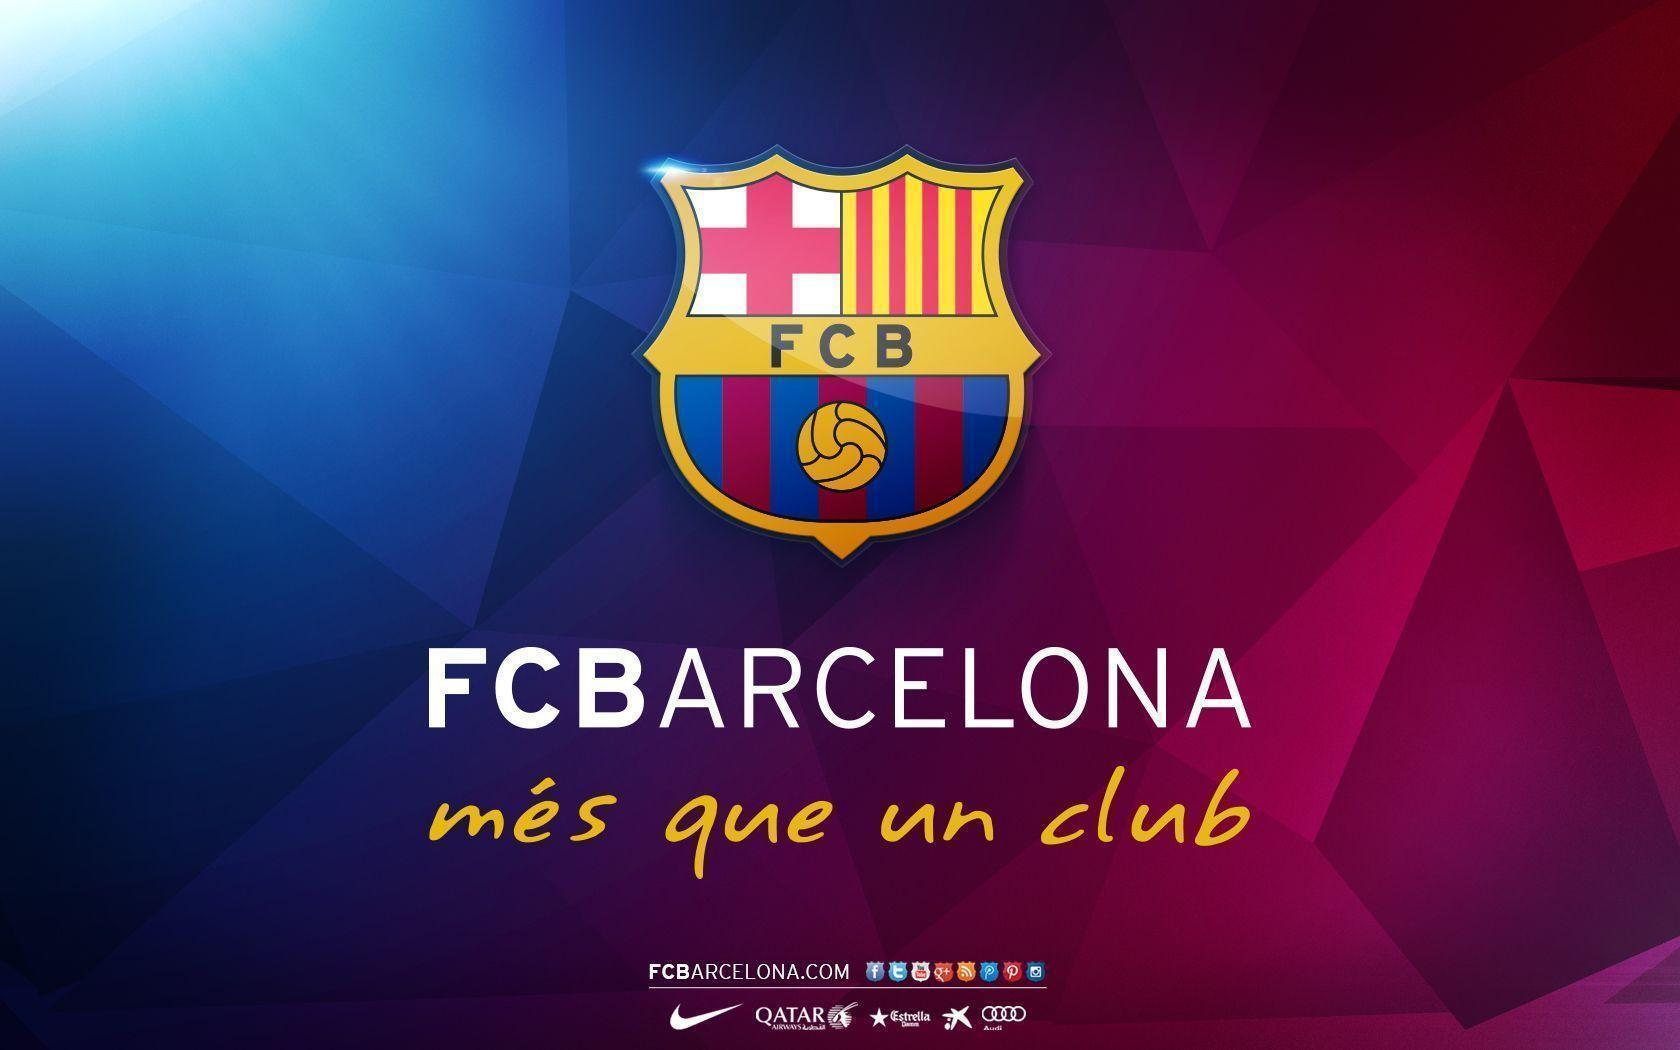 Football Barcelona Wallpaper Computer 35 #1176 Wallpaper | Cool .